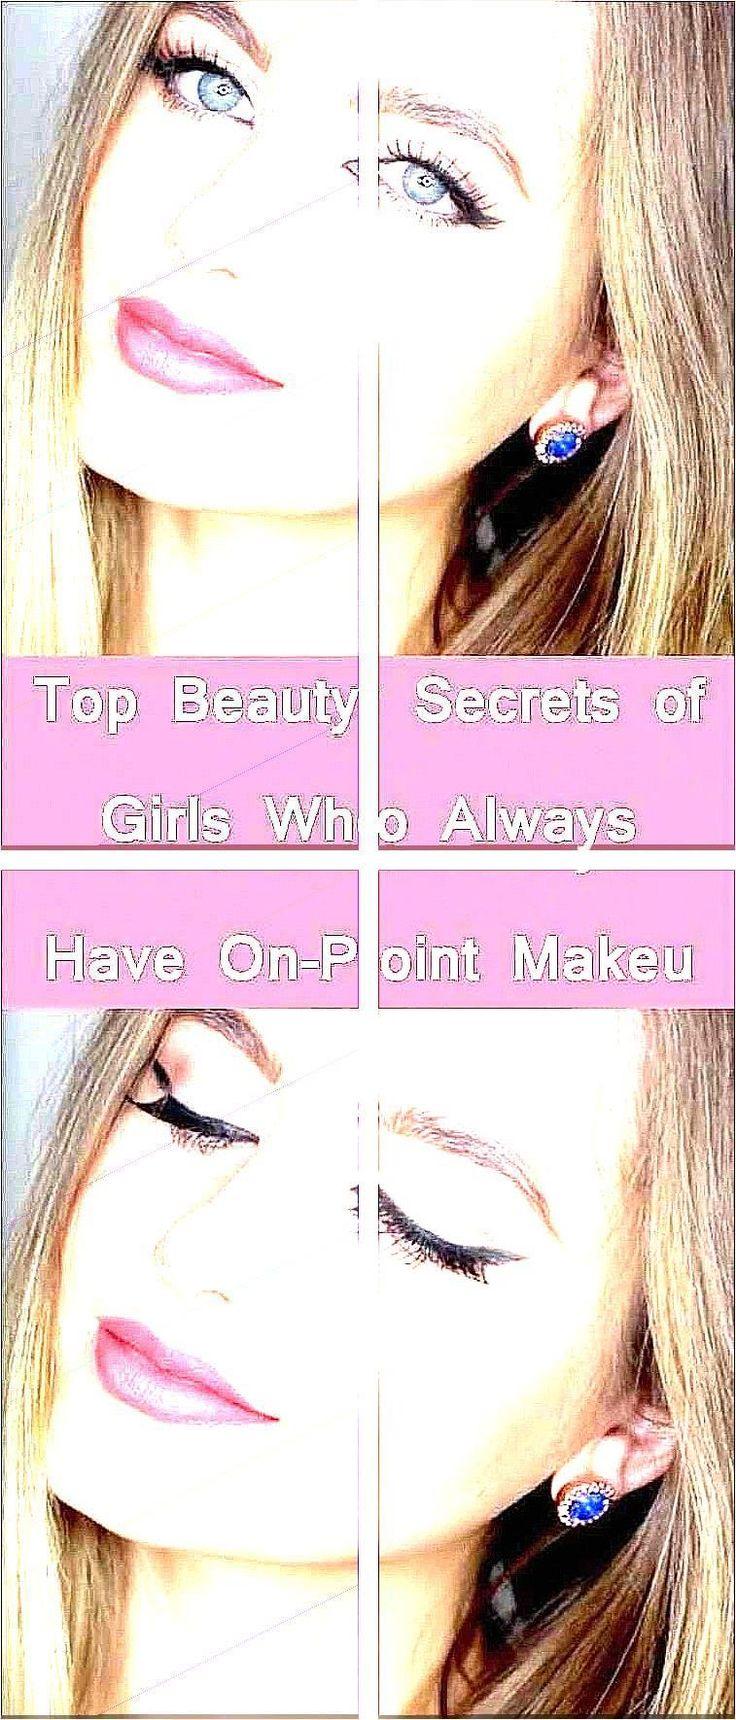 Best Eyebrow Threading Near Me | Perfect Makeup Eyebrows ...